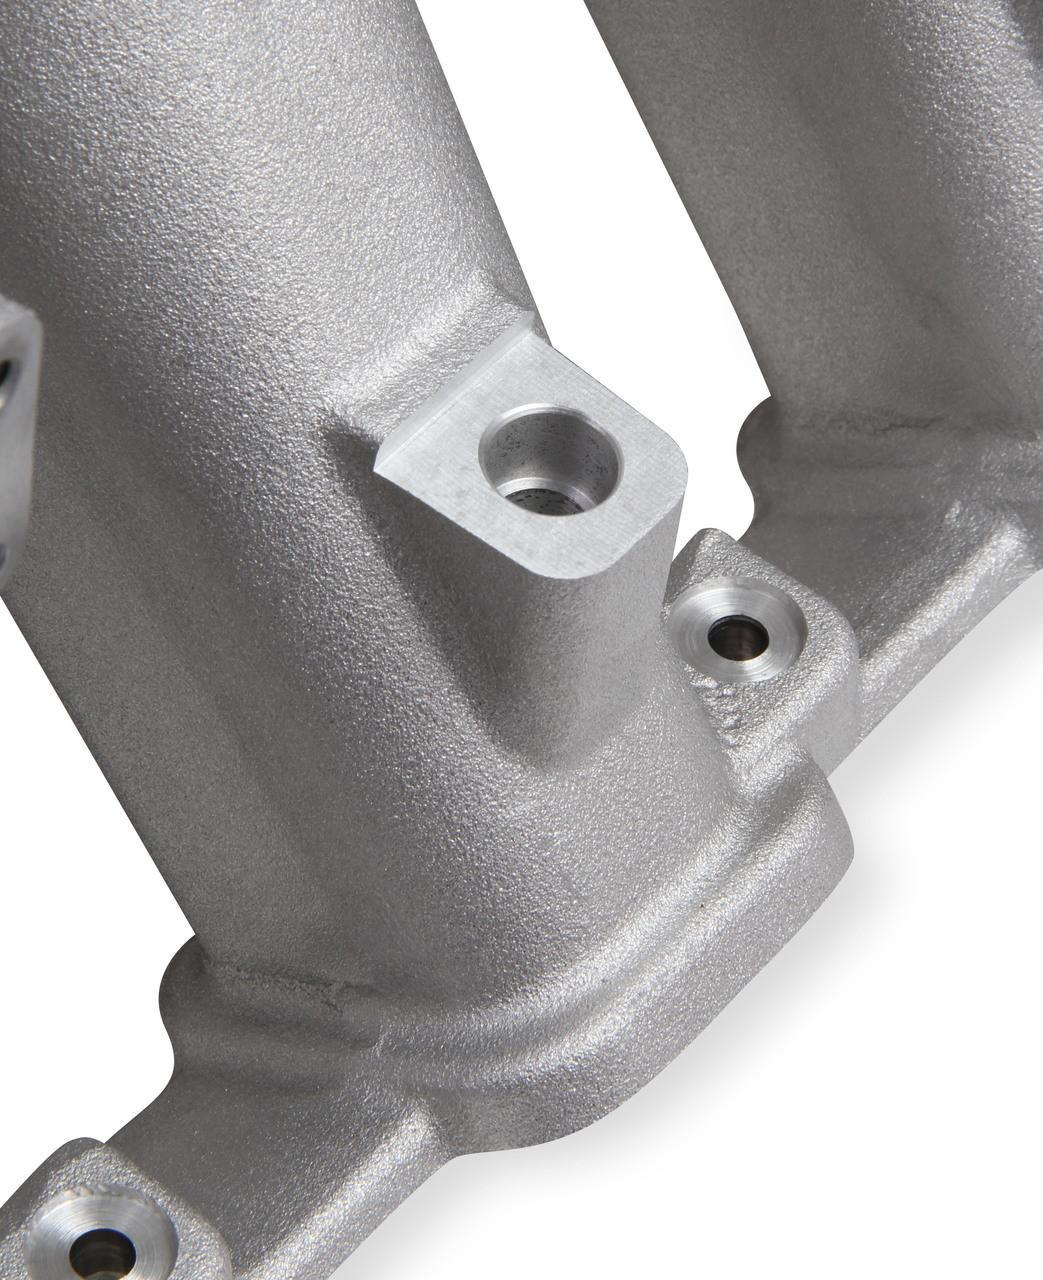 New Gm 2014 6 2l Lt1: Holley Hi-Ram Intake Manifold